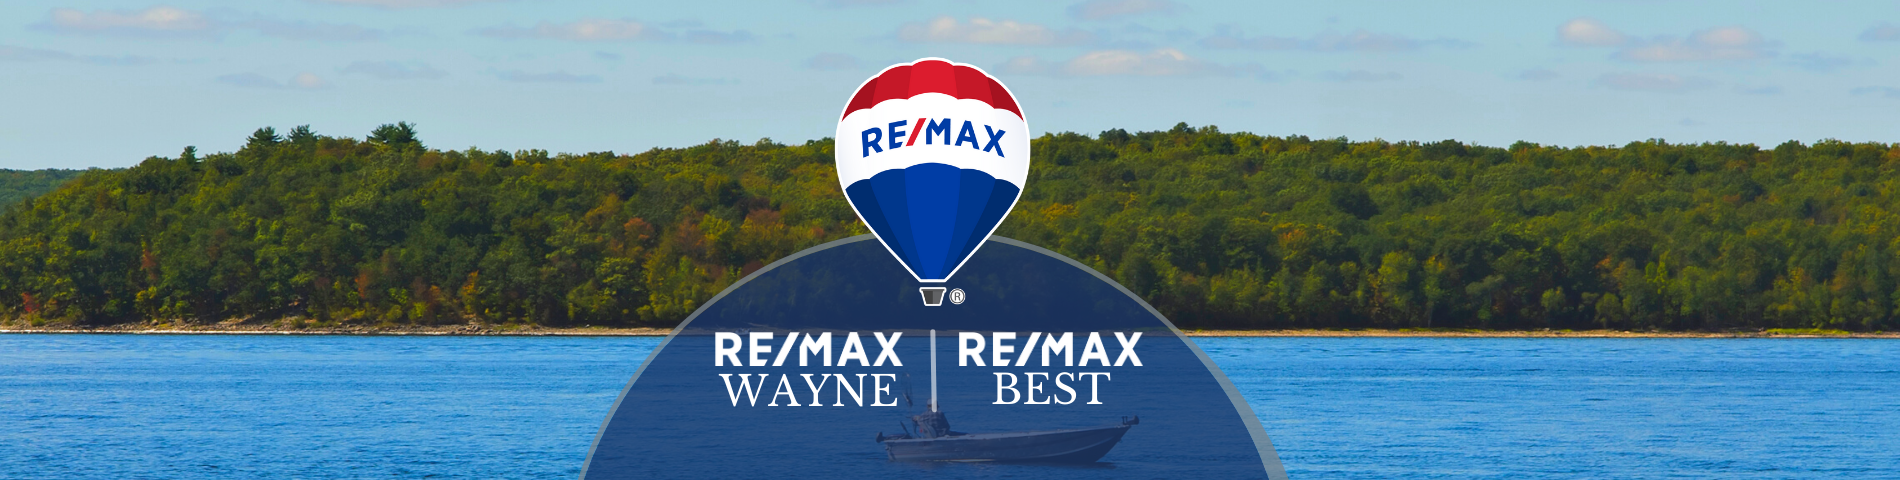 REMAX WAYNE - REMAX BEST